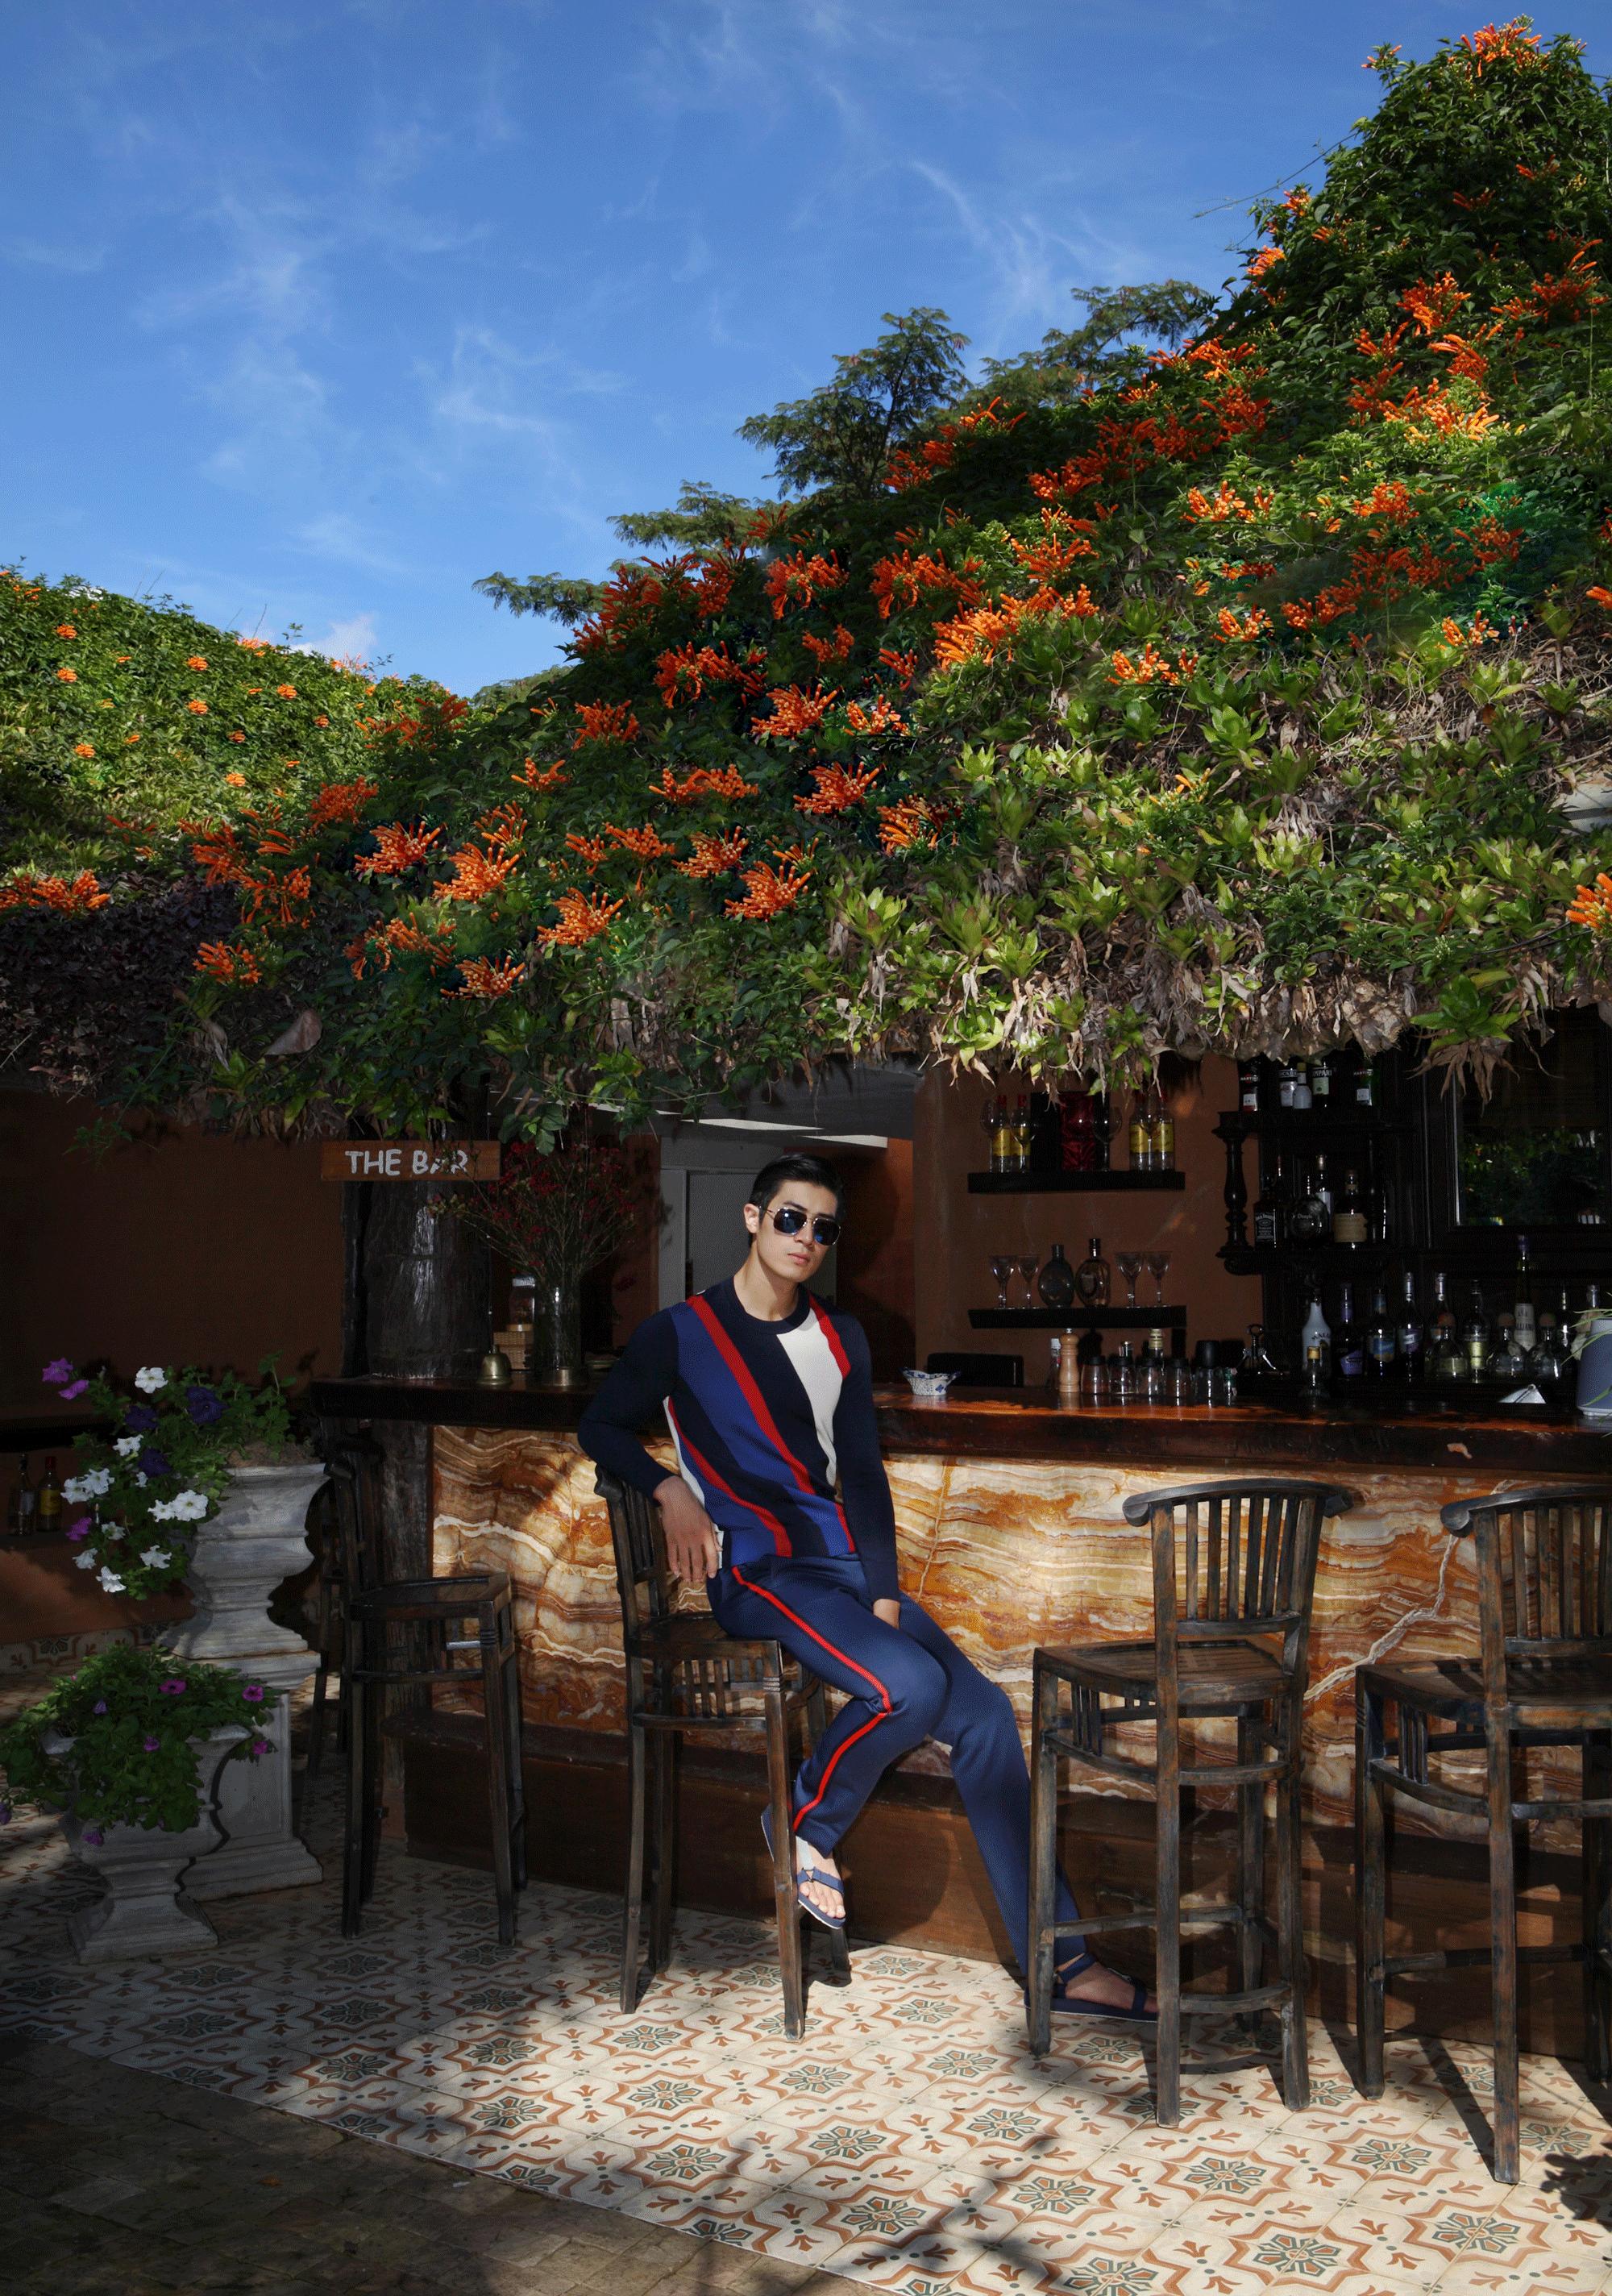 clothes : CK Calvin Klein / sunglasses : TAVAT